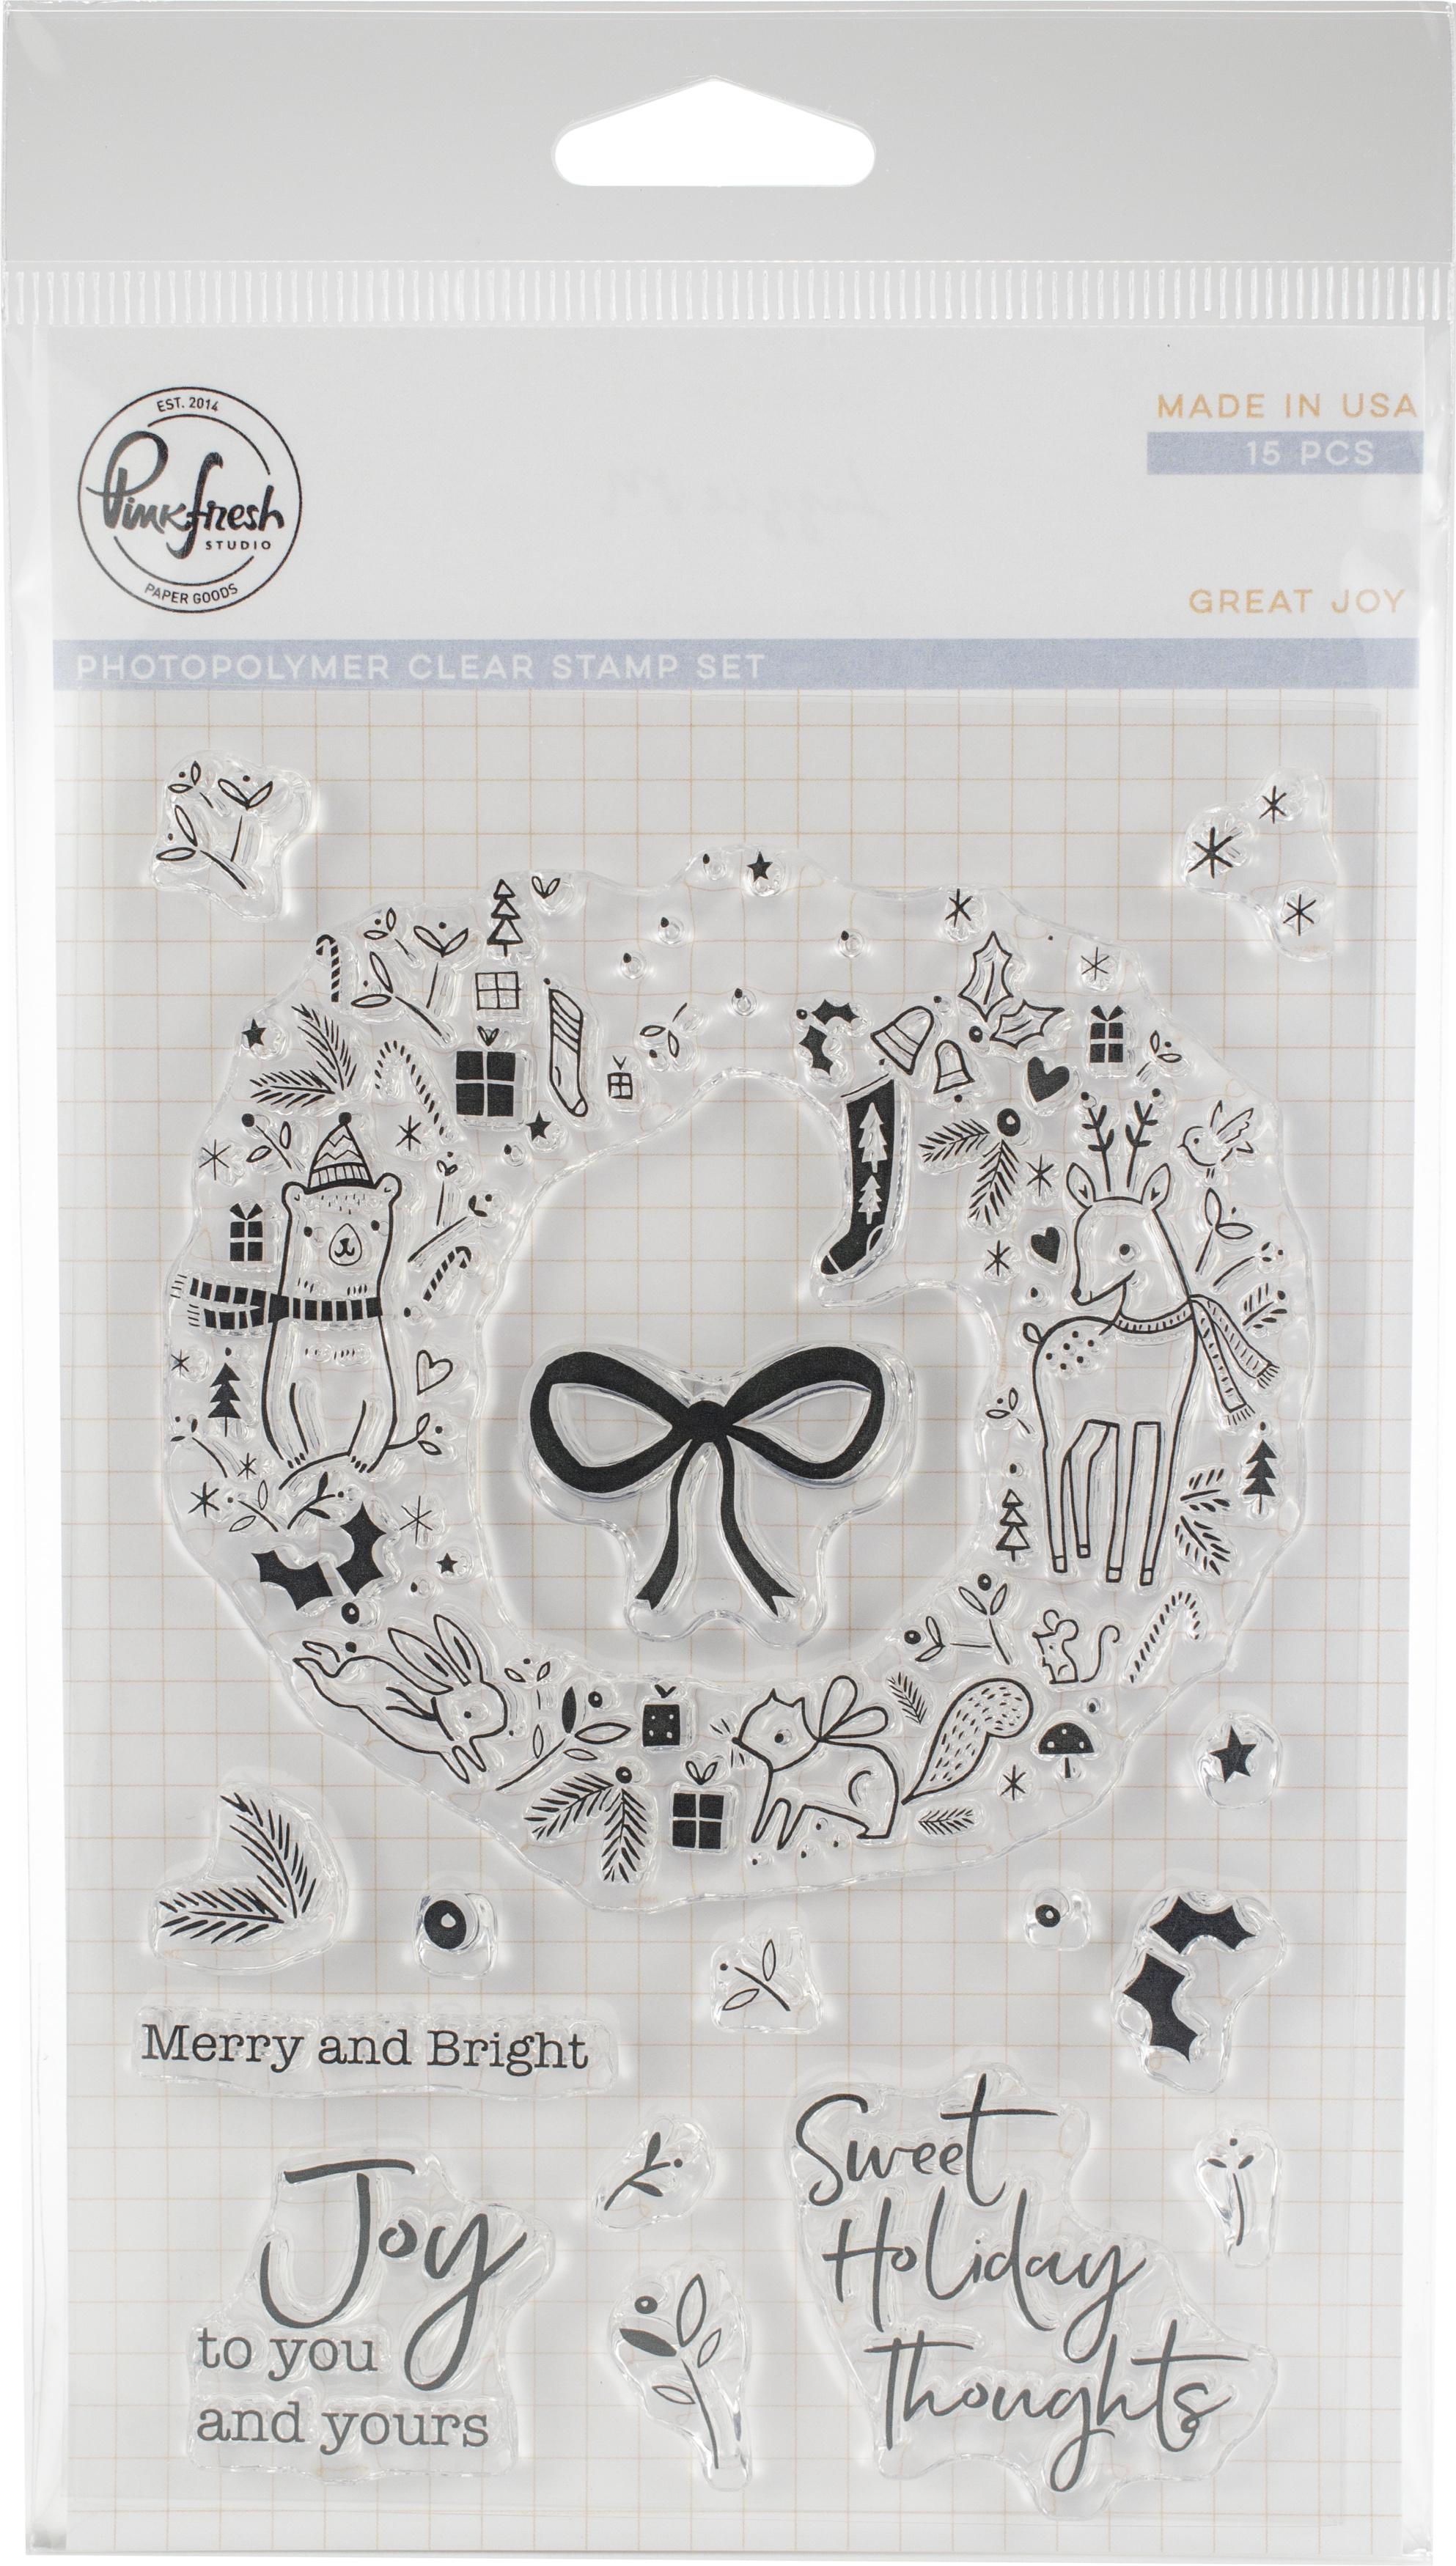 Pinkfresh Studio Clear Stamp Set 4X6-Great Joy